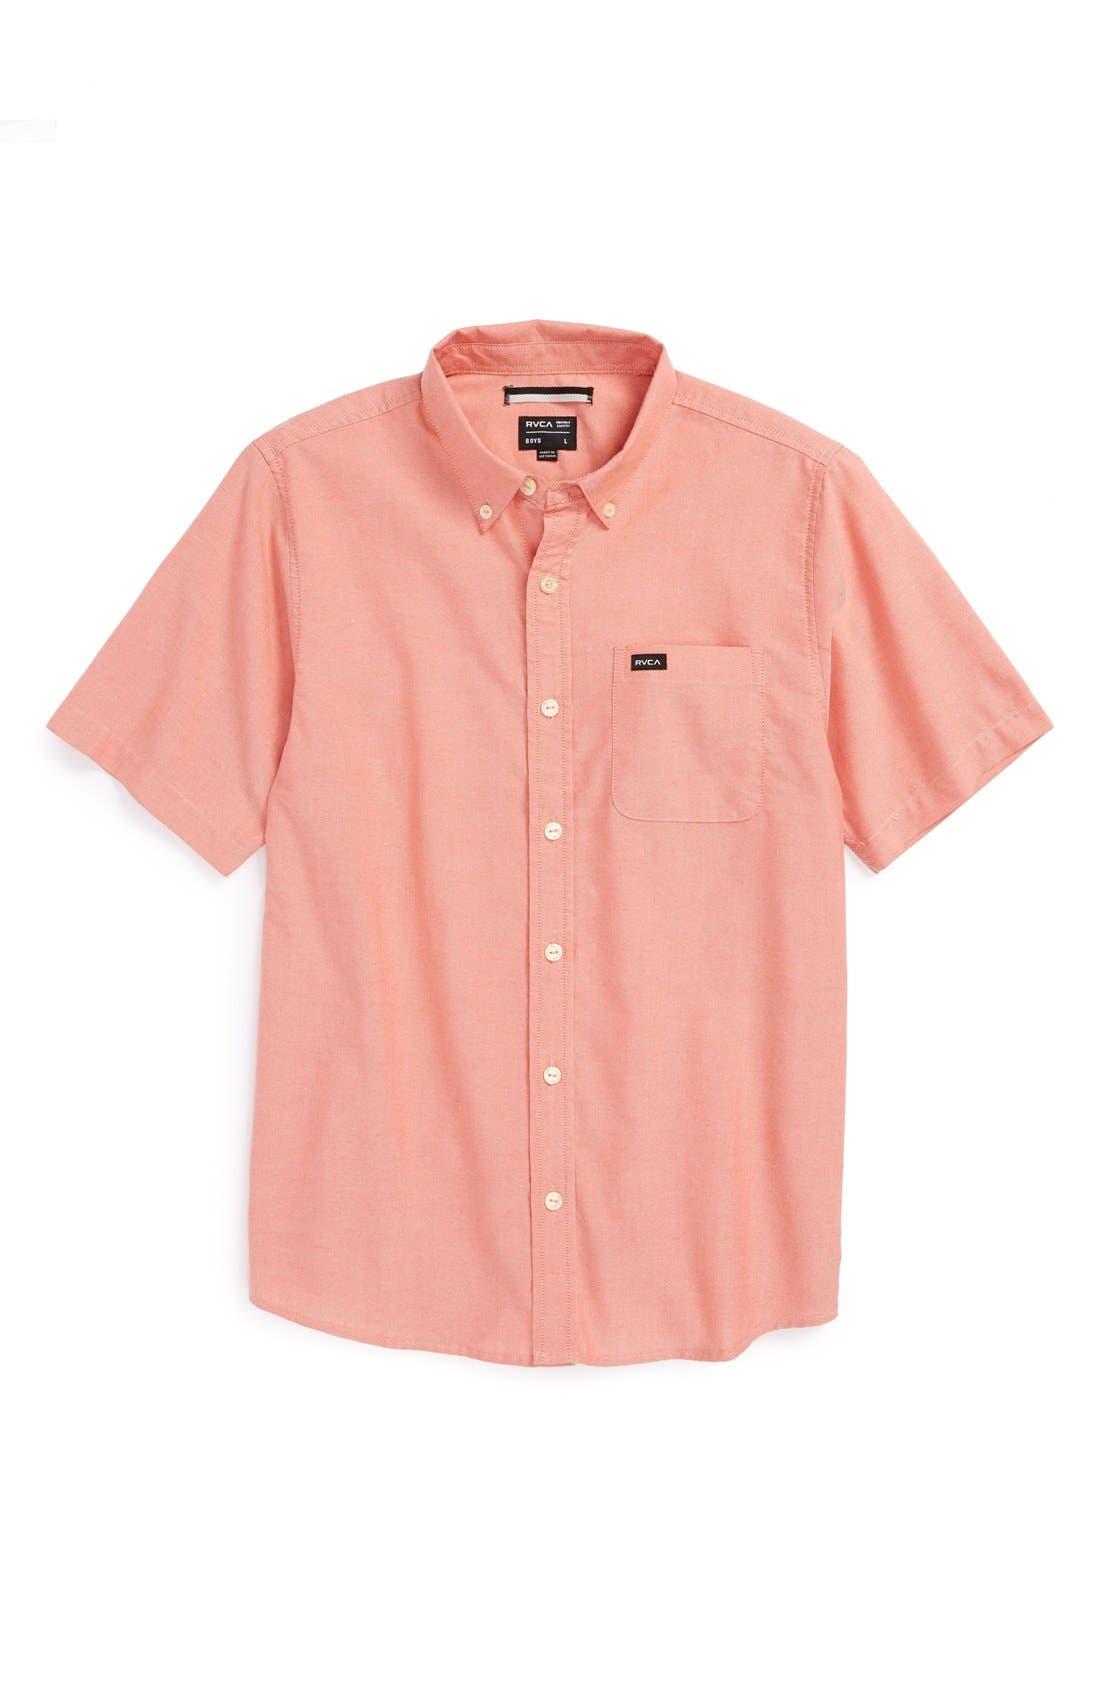 'That'll Do' Woven Shirt,                             Main thumbnail 15, color,